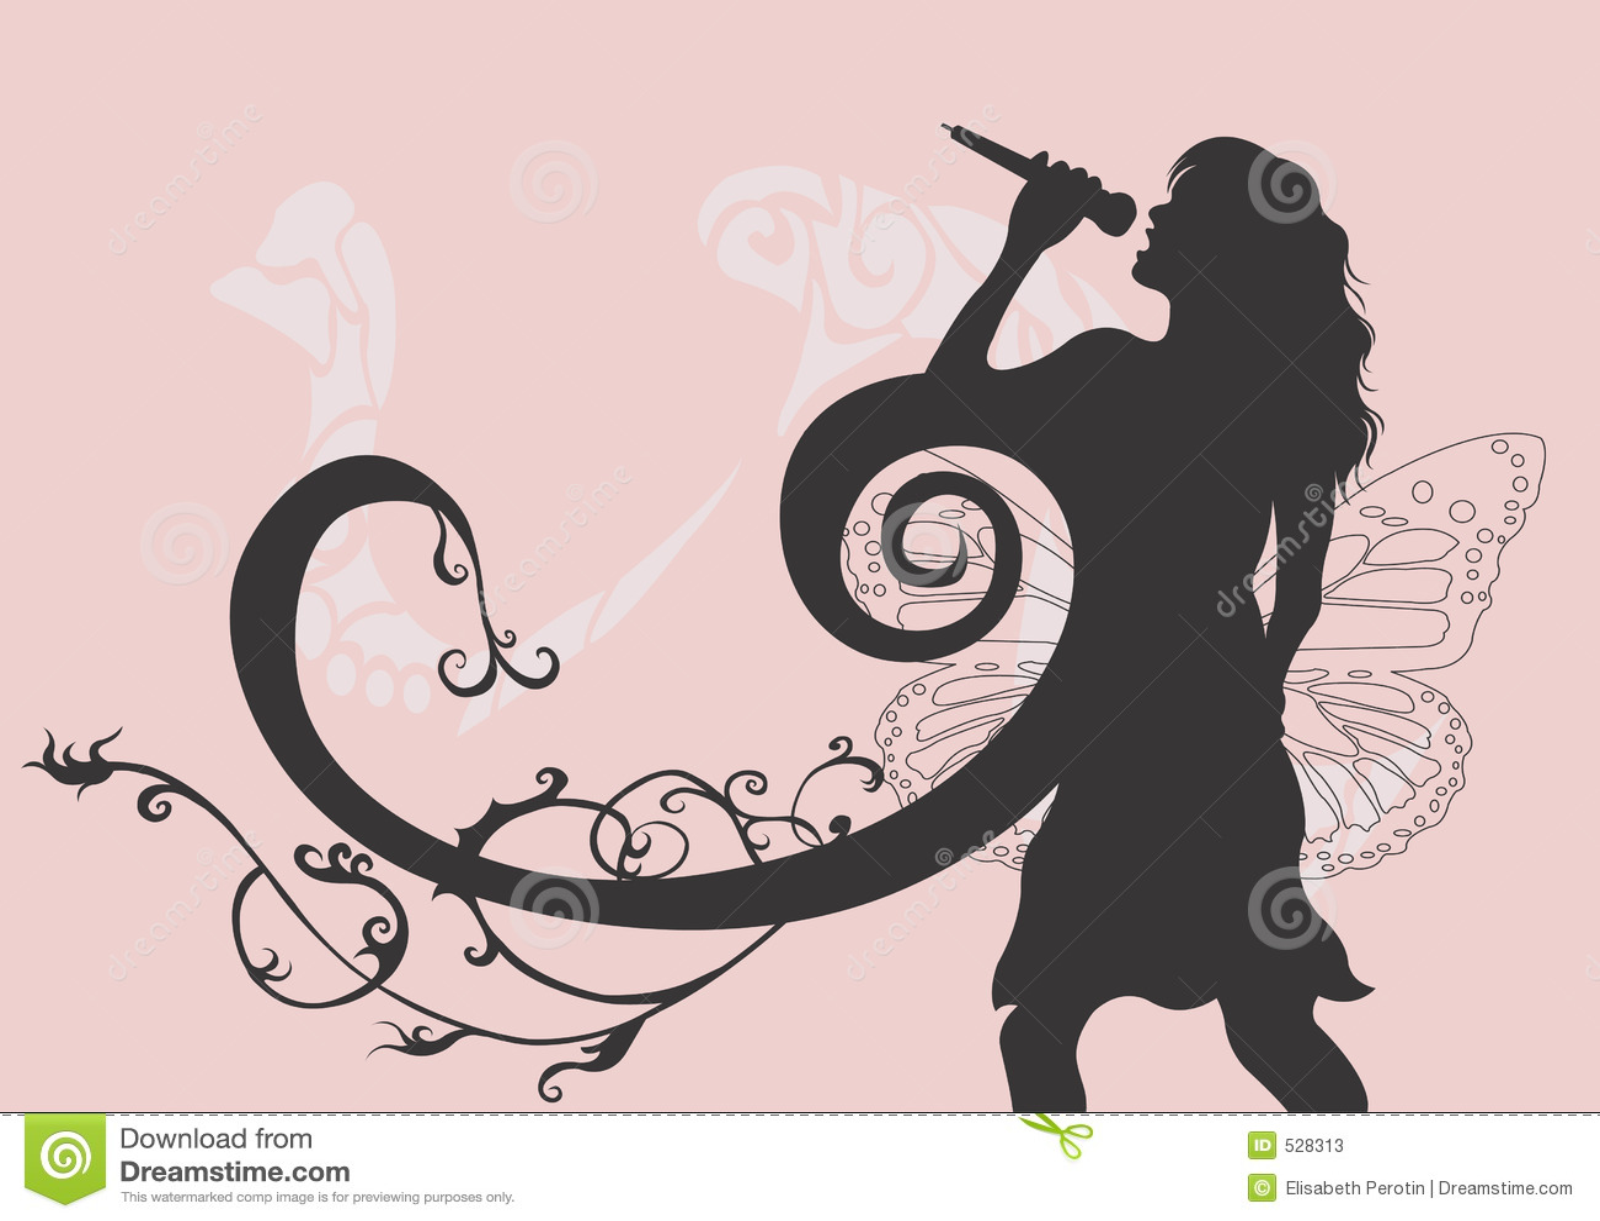 Download 歌唱家 库存例证. 插画 包括有 语音, 模式, 例证, 执行者, 艺术性, 艺术, 设计, 人员, 装饰品 - 528313